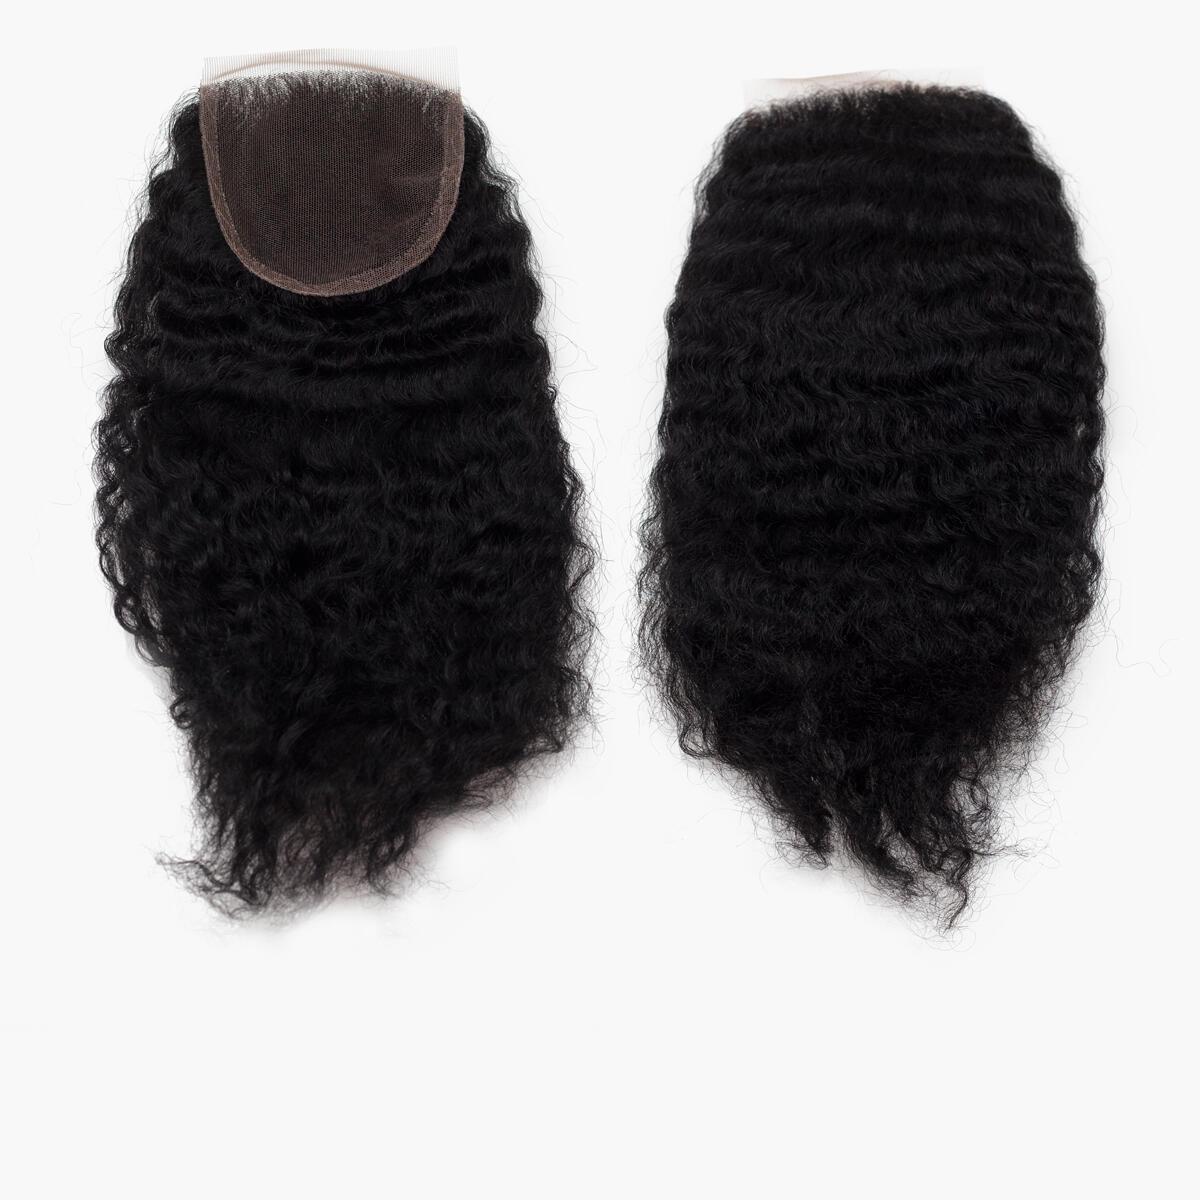 Lace Closure Coily Curl 1.0 Black 25 cm